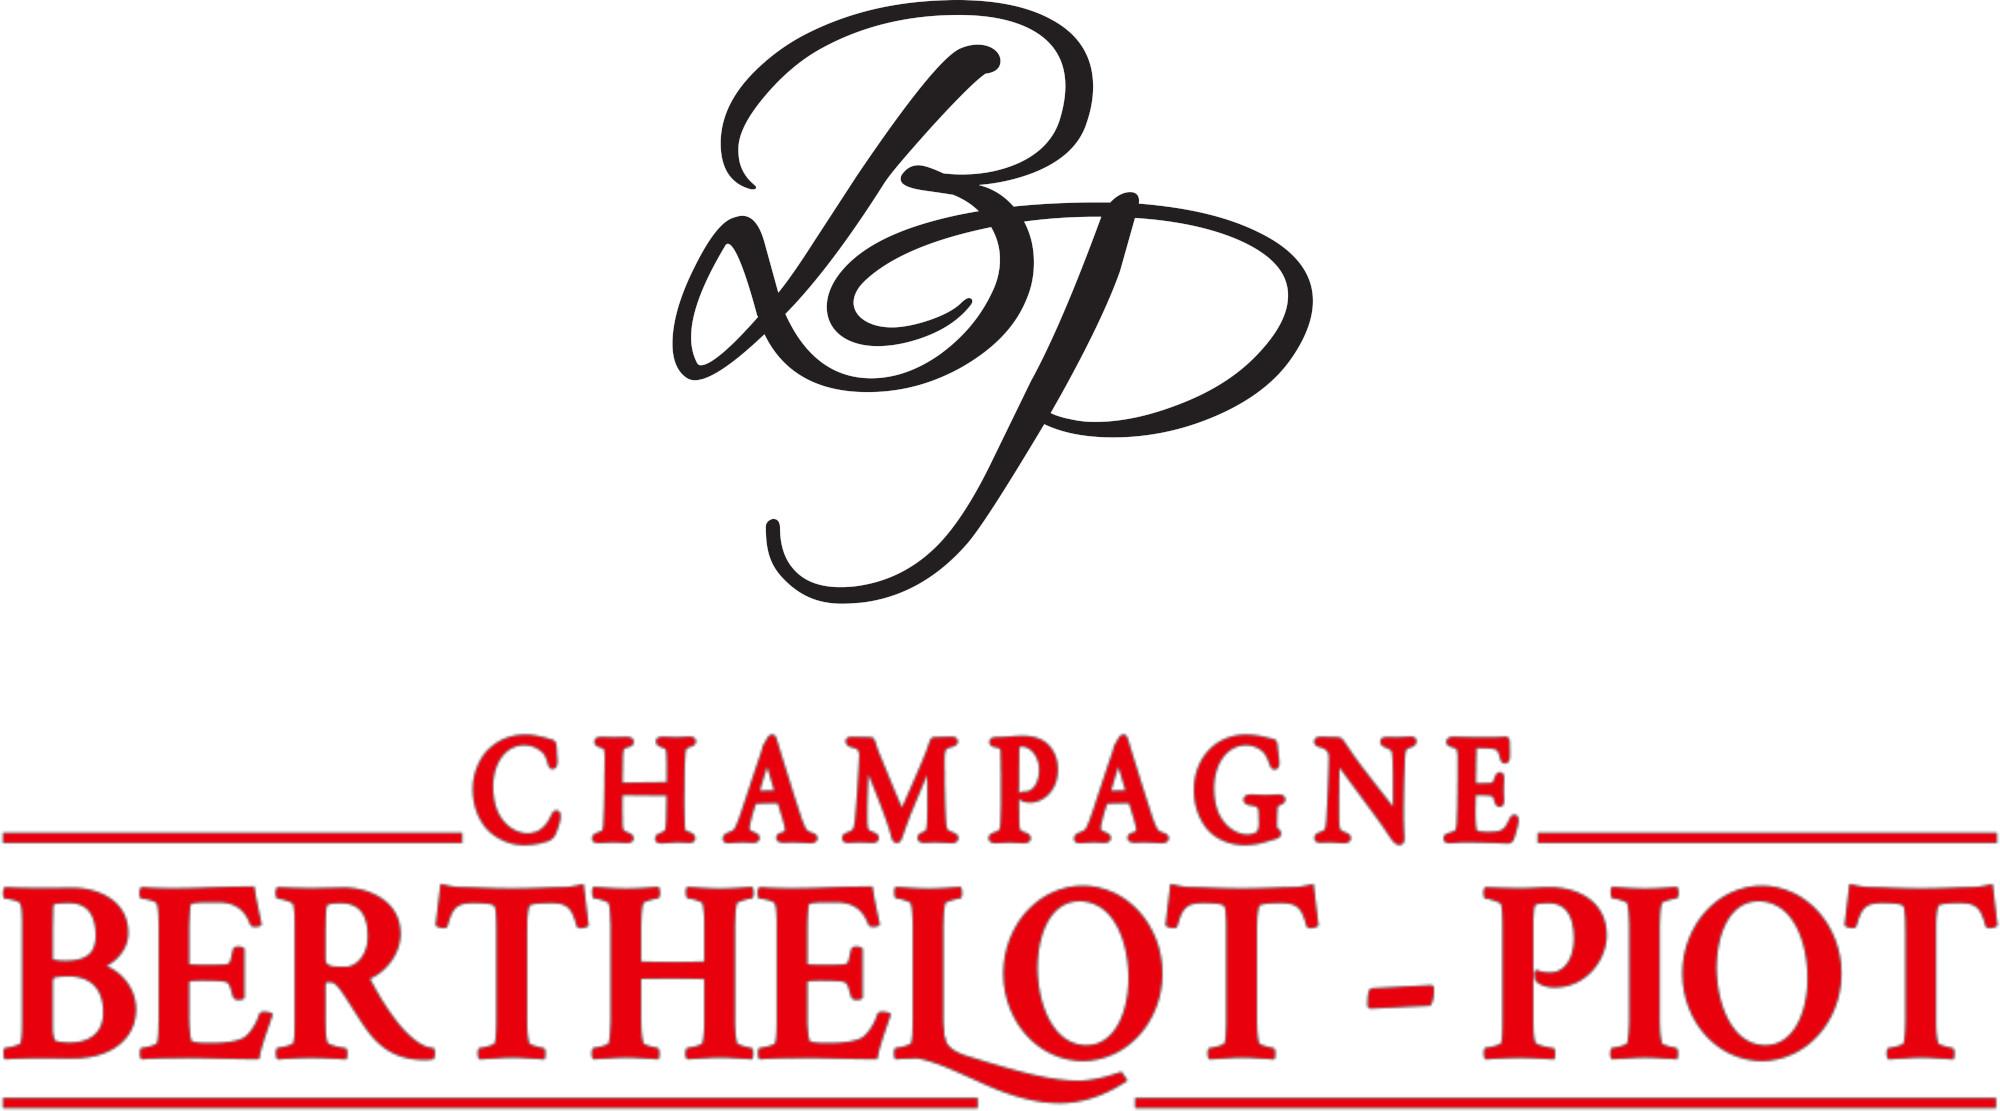 Berthelot-Piot Champagne